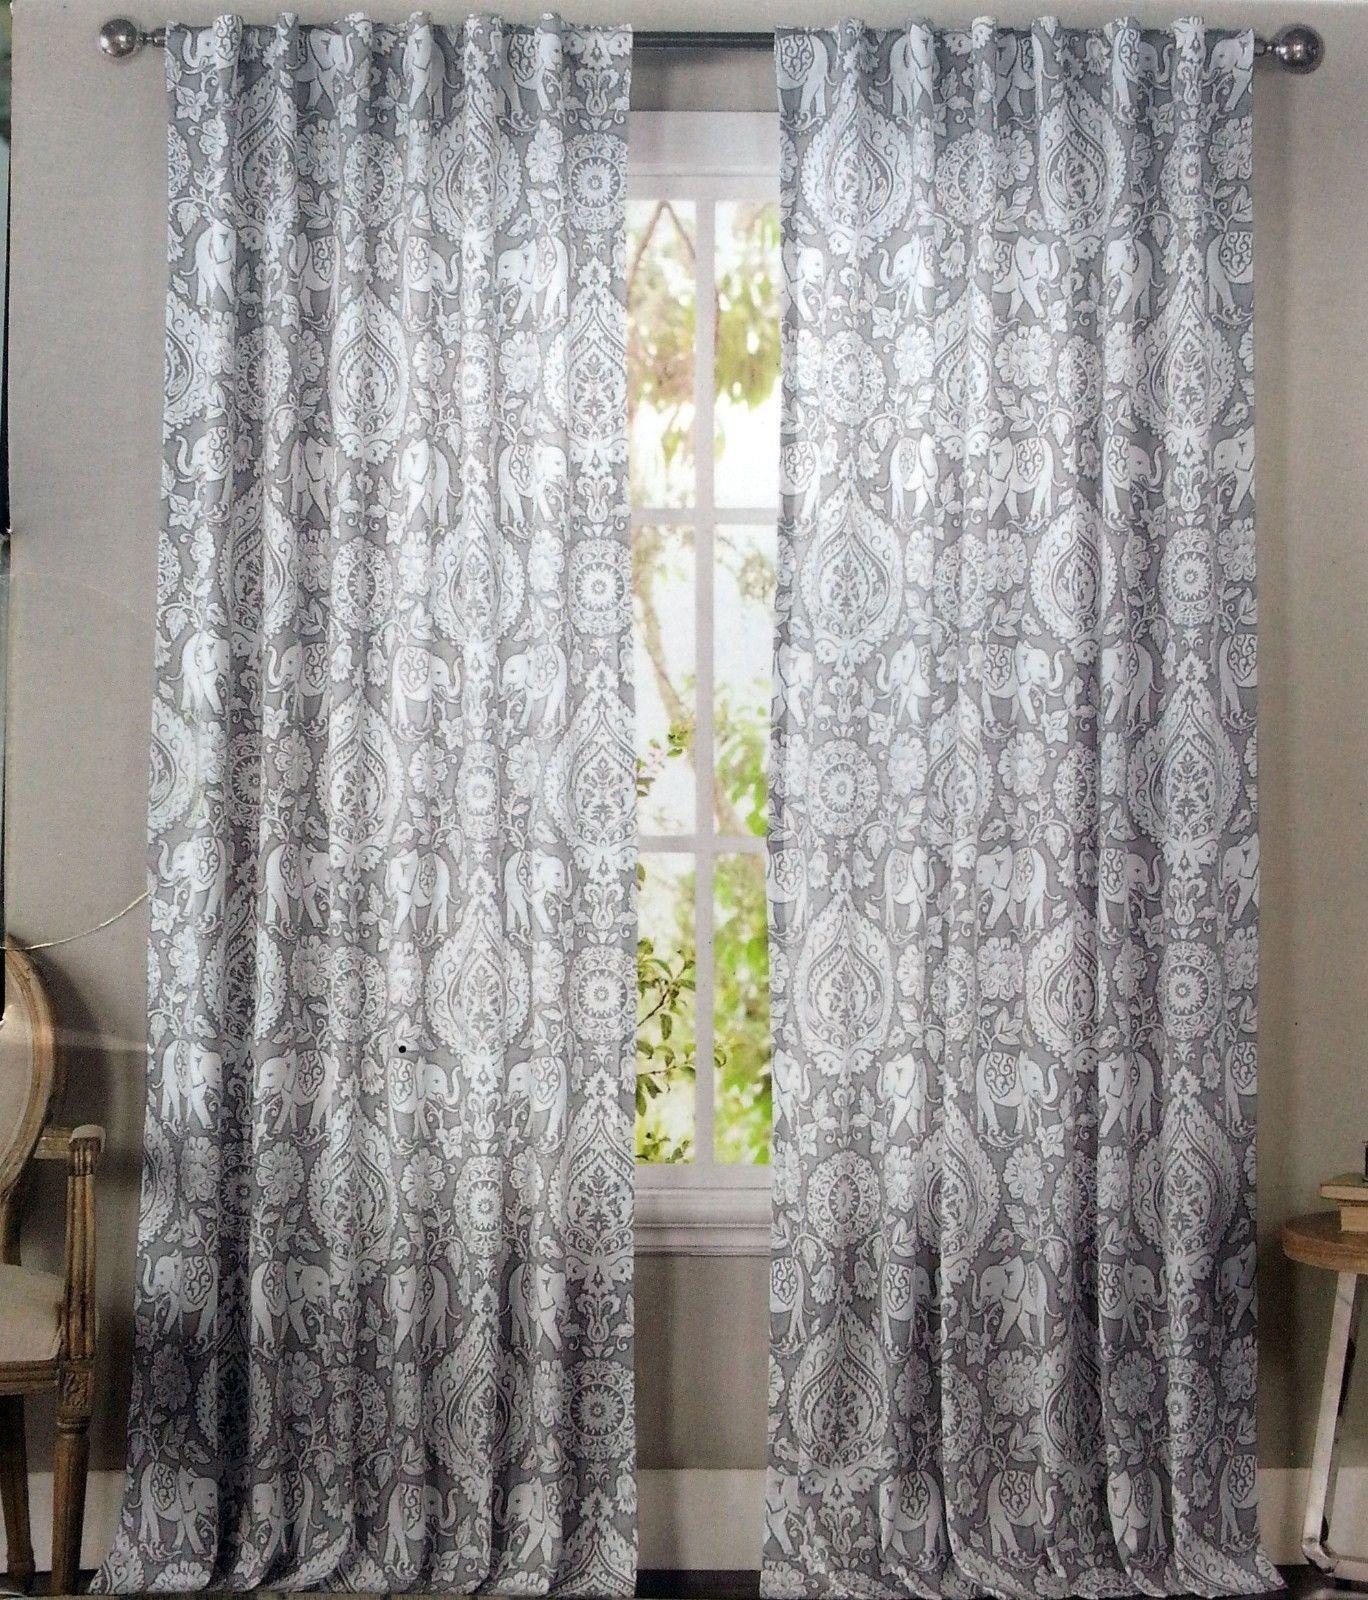 Mandala Elephant Pair Window Panels 50 By 96 Inch Set Of 2 Floral